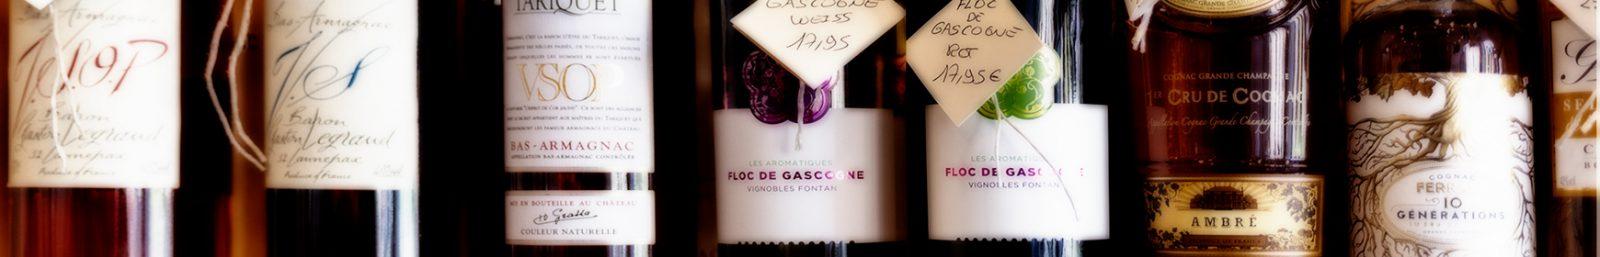 Armagnac, Cognac, Floc